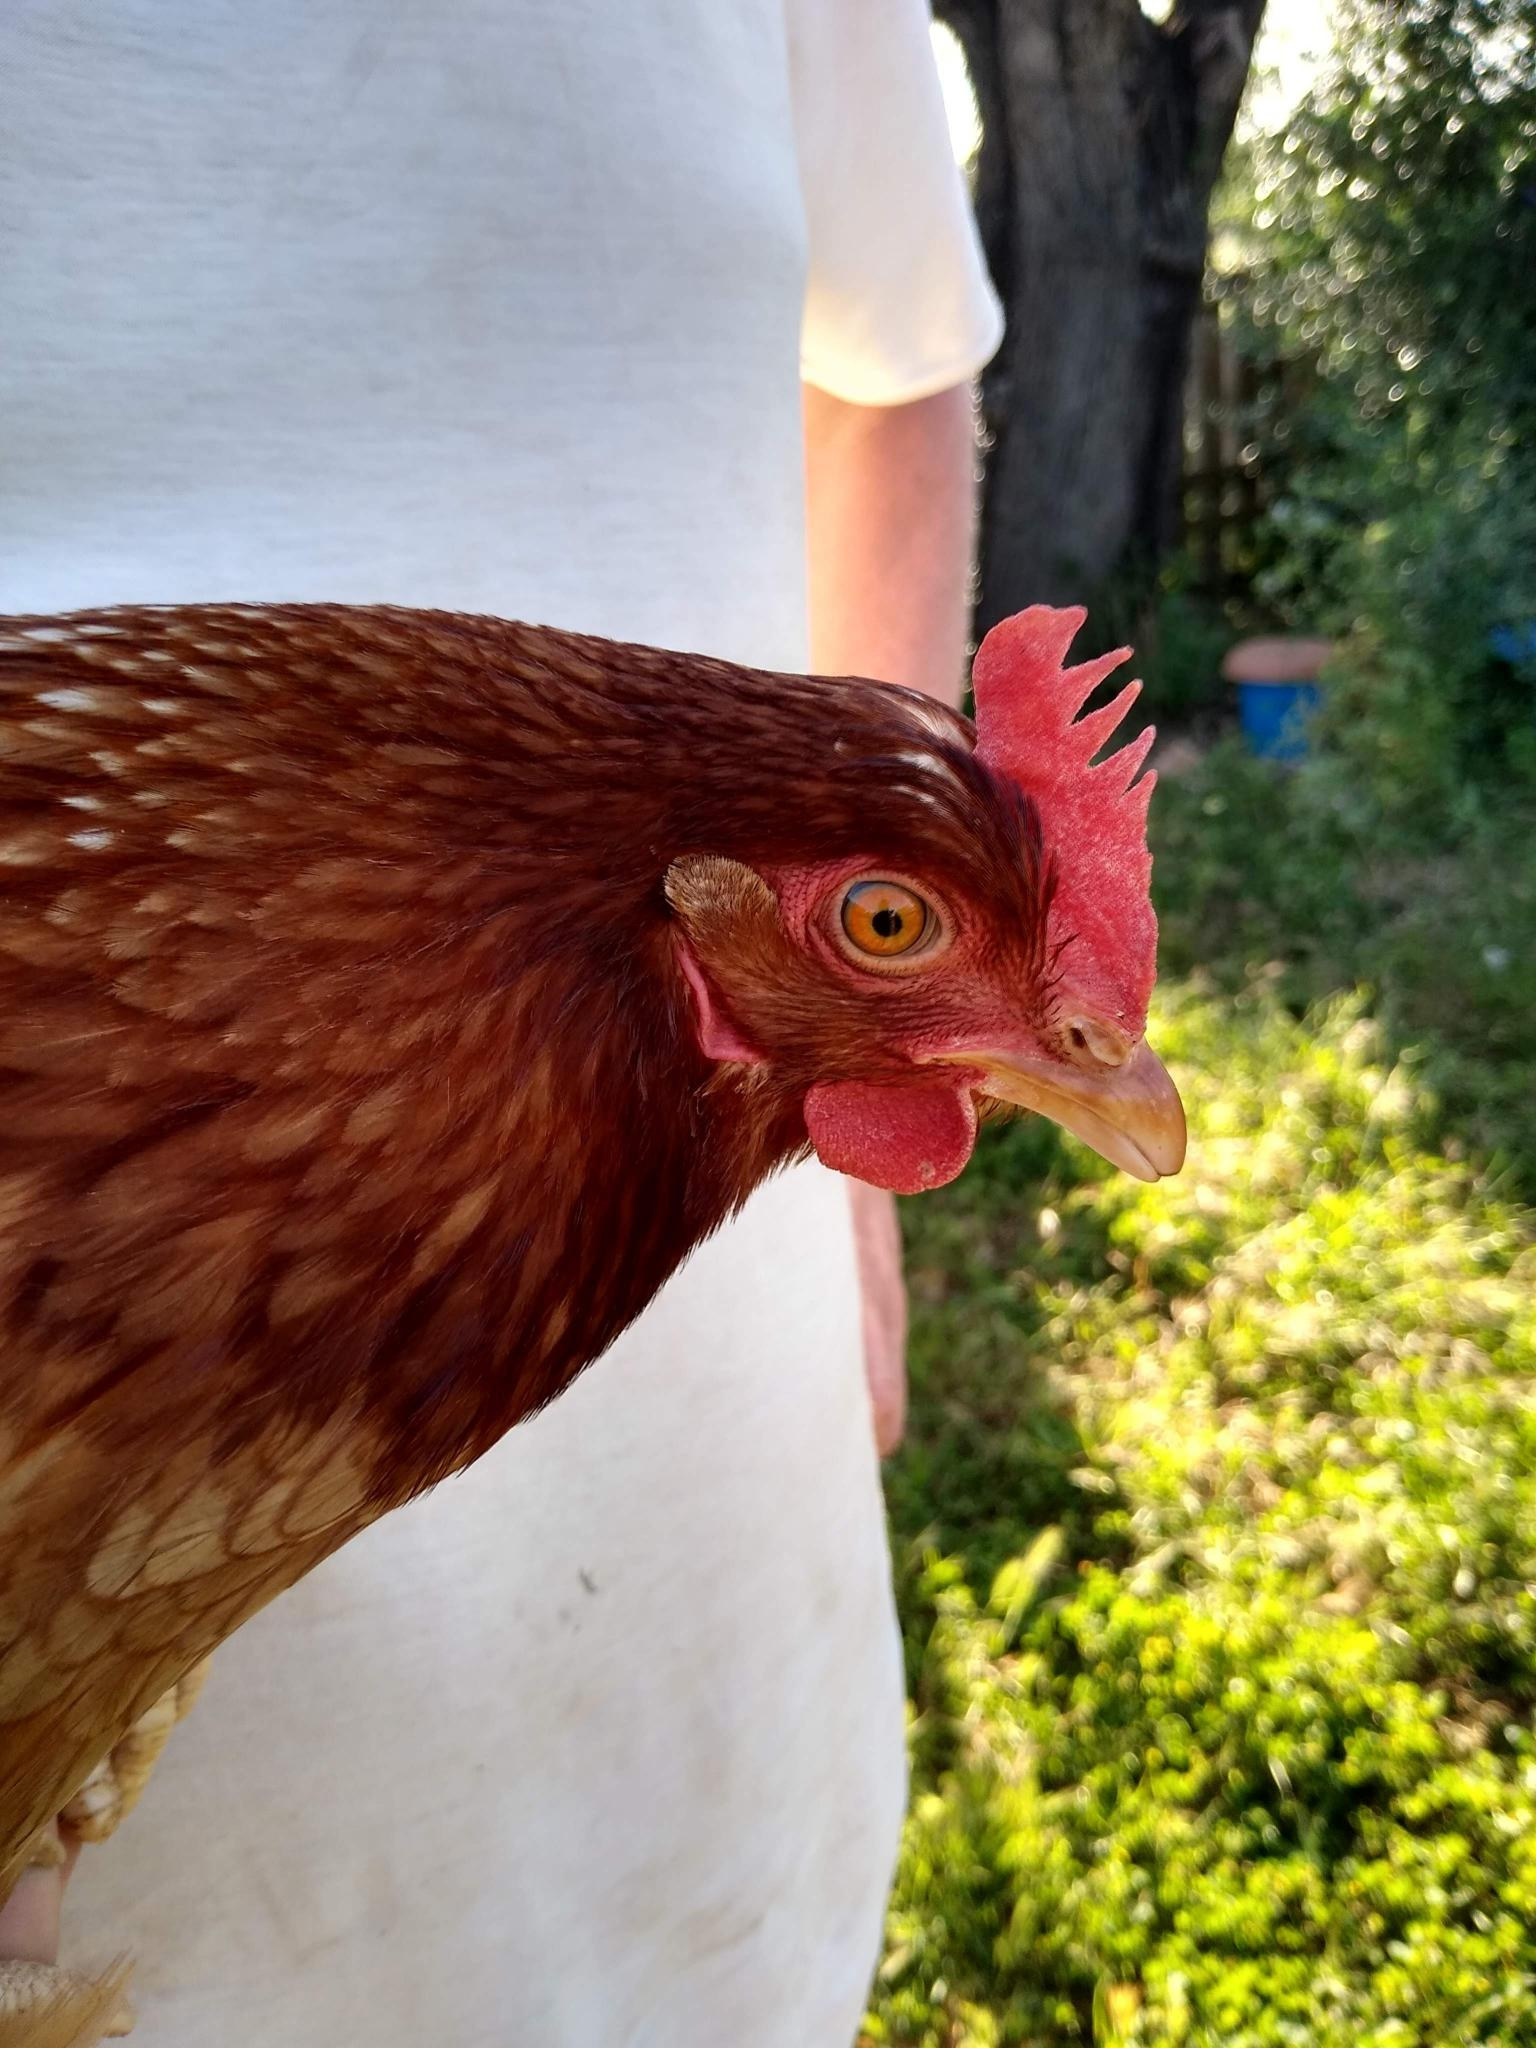 One very cross captured chicken